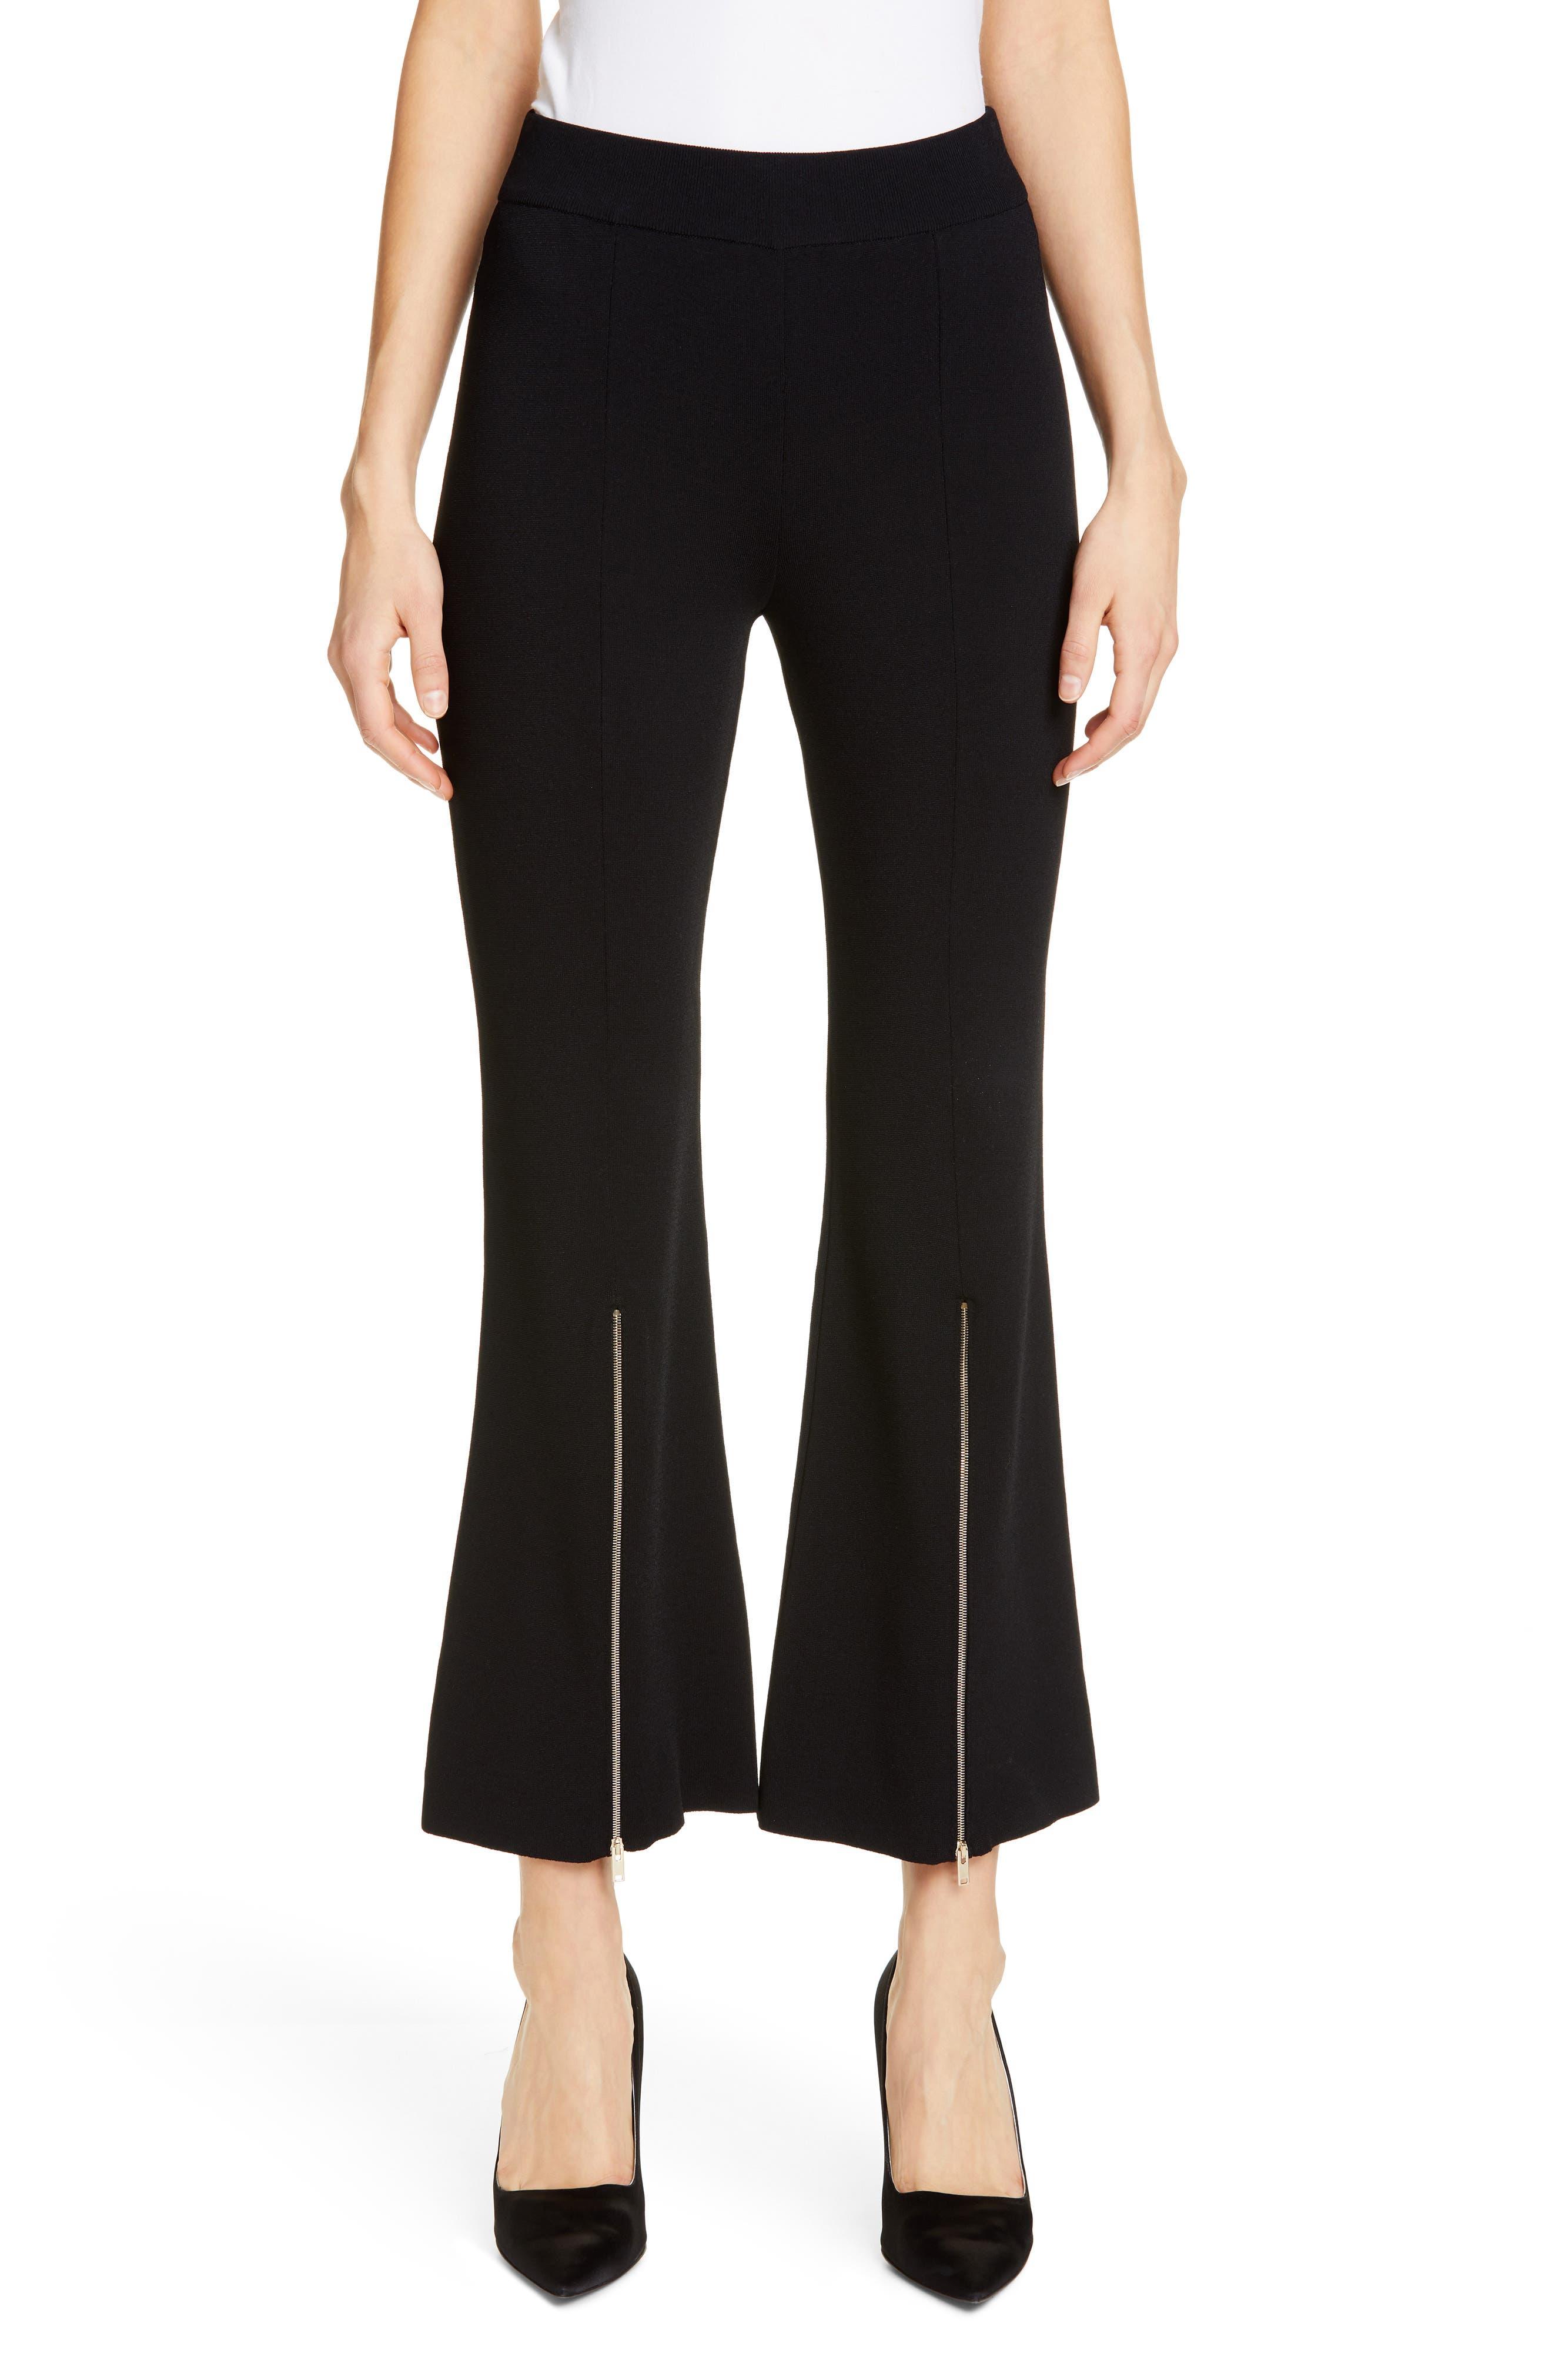 Stella Mccartney Zip Detail Crop Flare Pants, 4 IT - Black